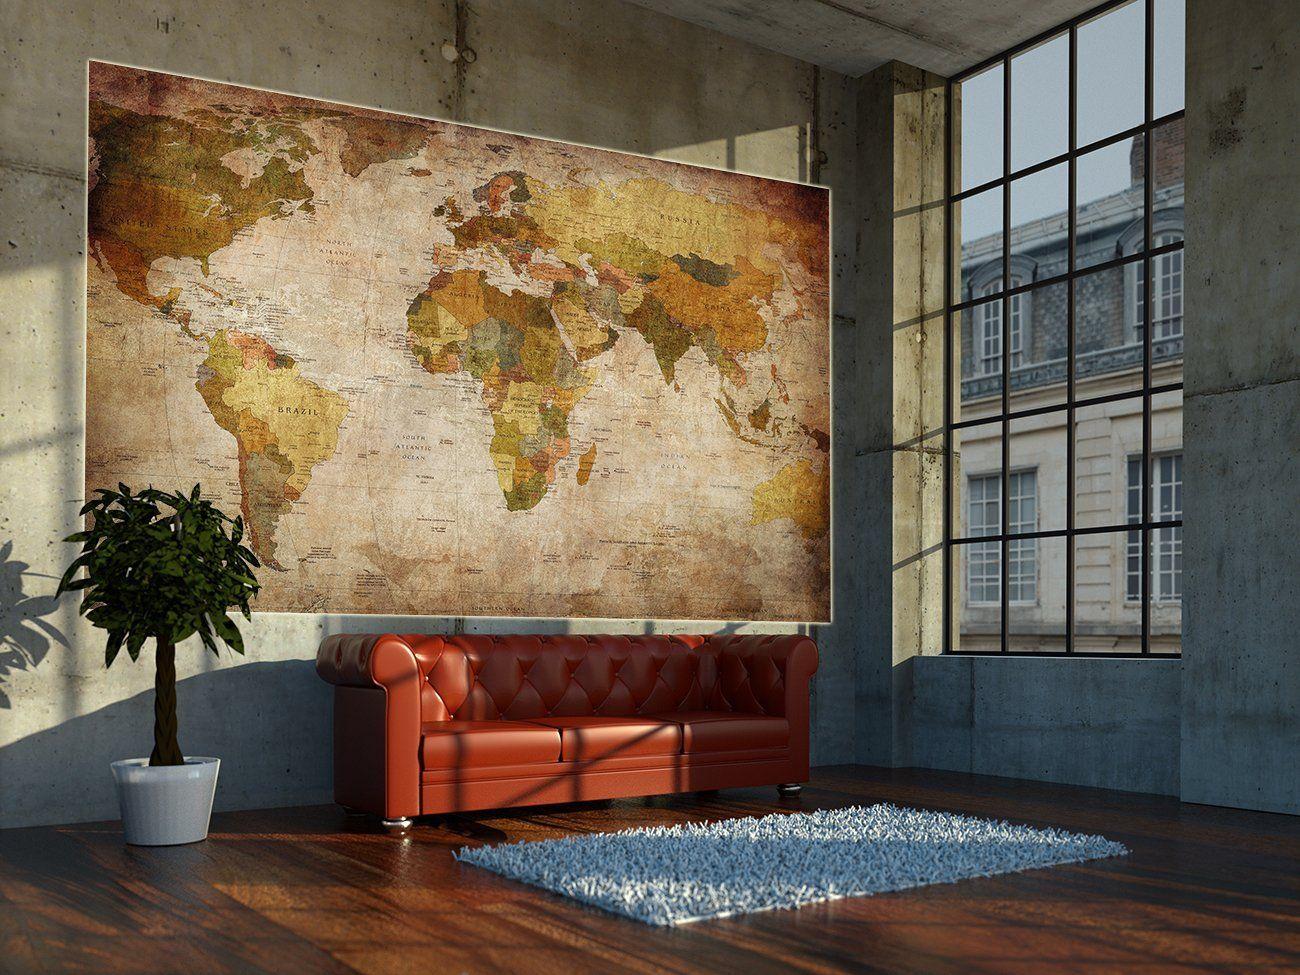 world map photo wallpaper vintage retro. Black Bedroom Furniture Sets. Home Design Ideas